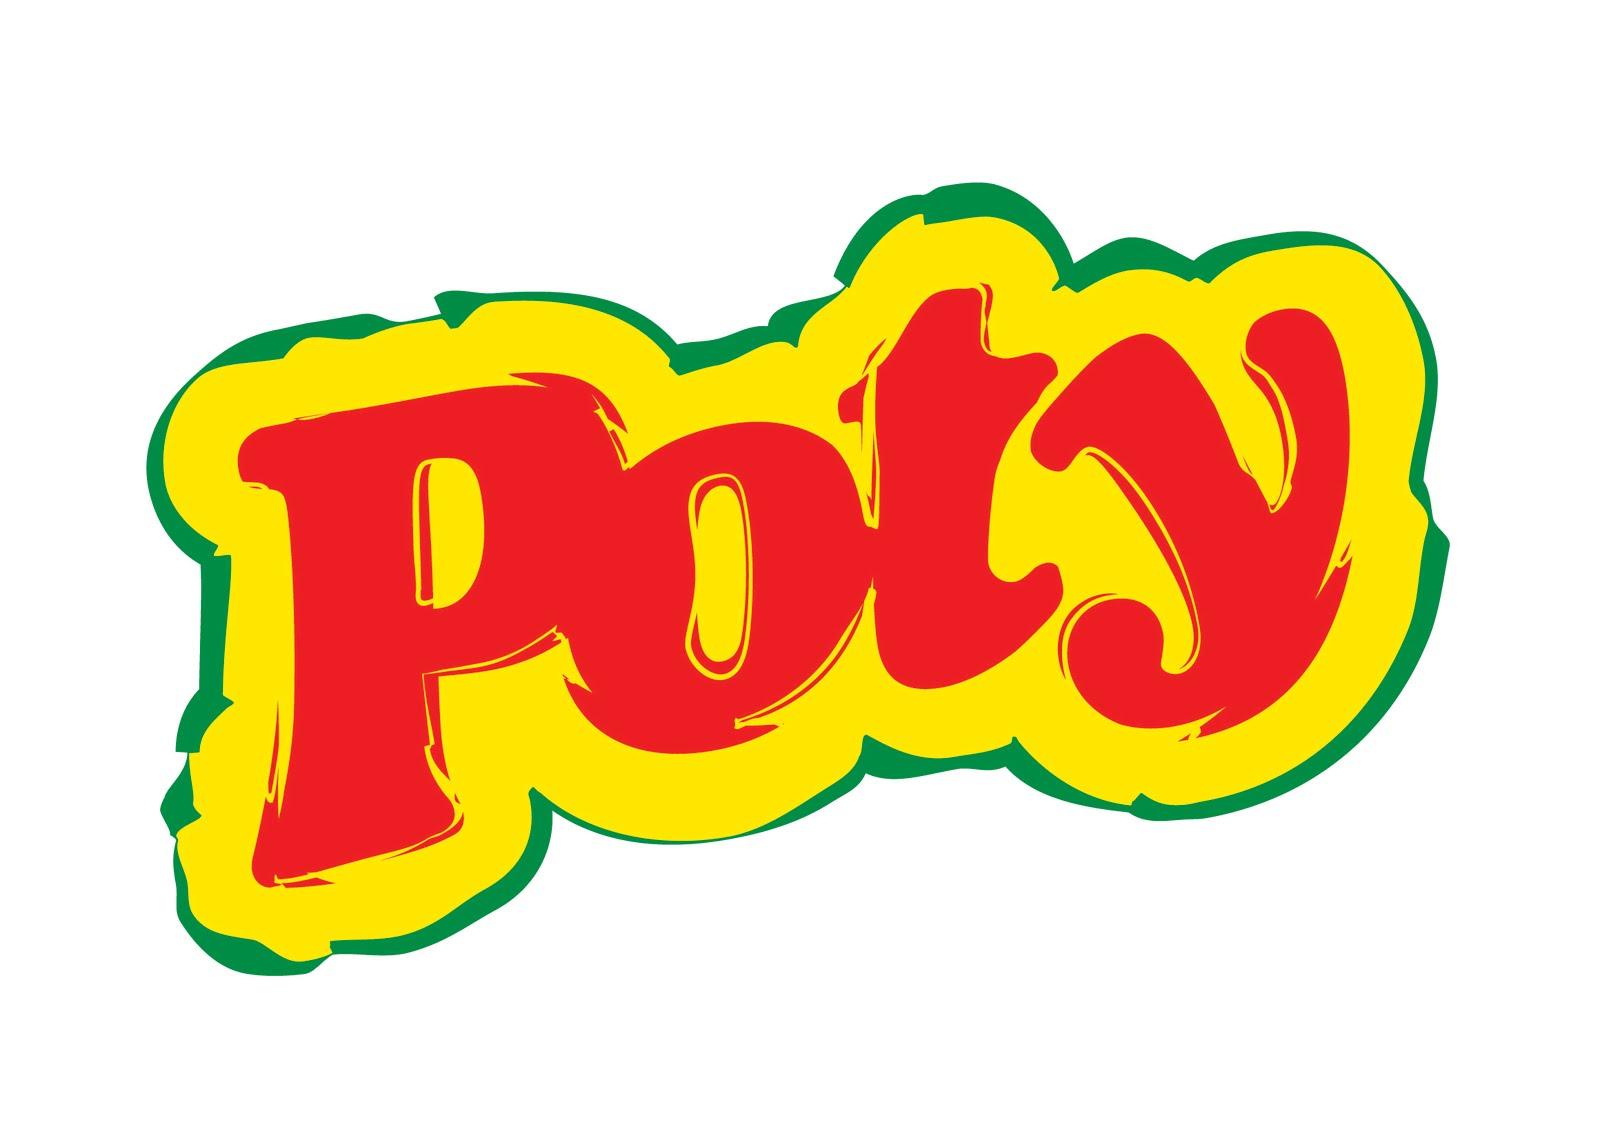 http://2.bp.blogspot.com/-w5VXGYvU96M/TnJRuGBscrI/AAAAAAAAAAY/jEkQjYMirGM/s1600/logo+poty.jpg